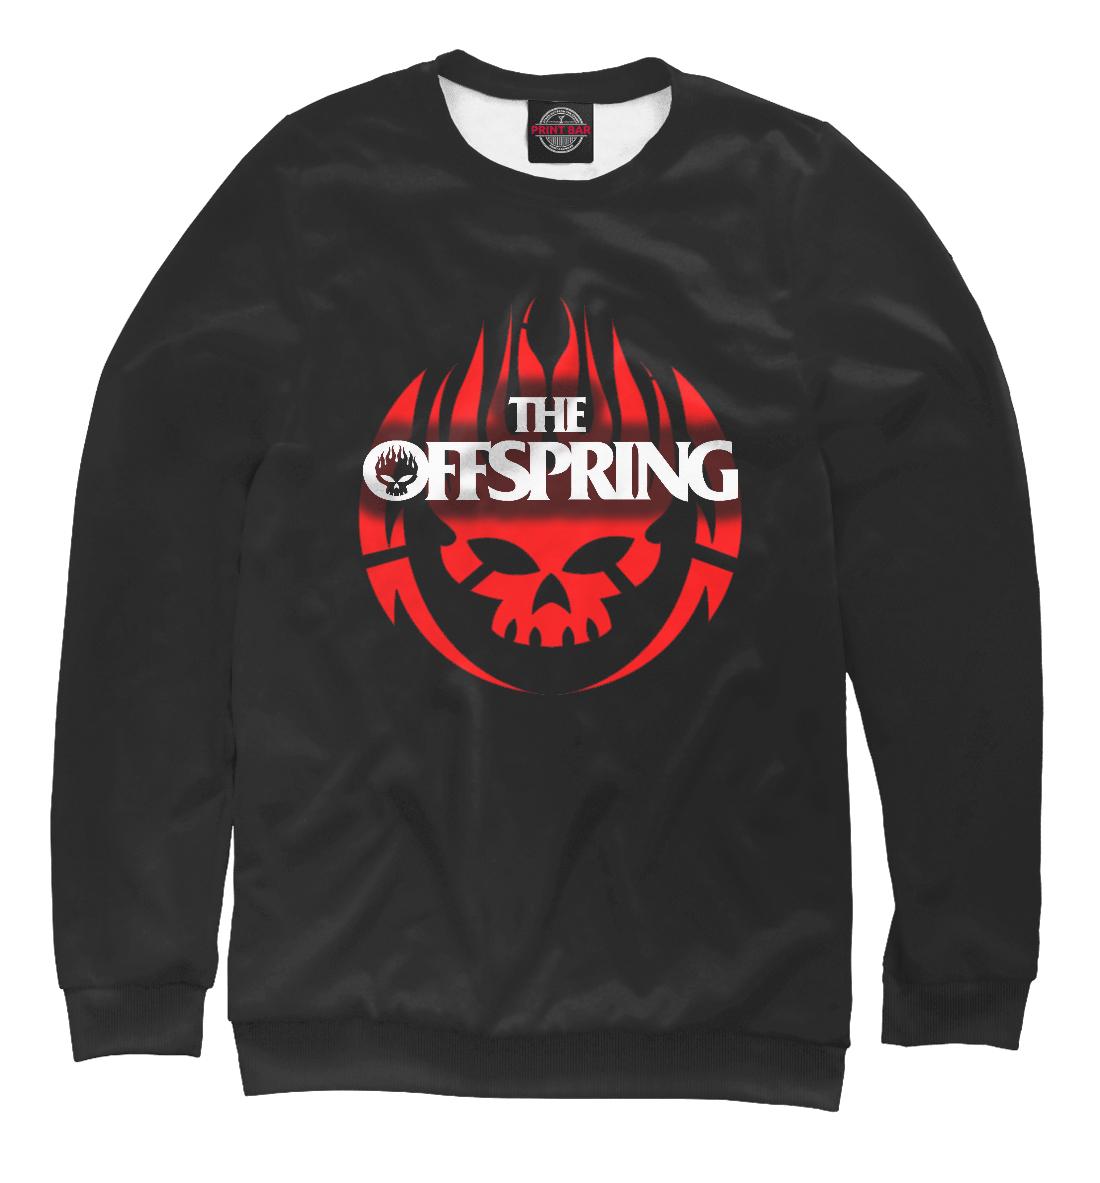 Купить The Offspring, Printbar, Свитшоты, MZK-616914-swi-2